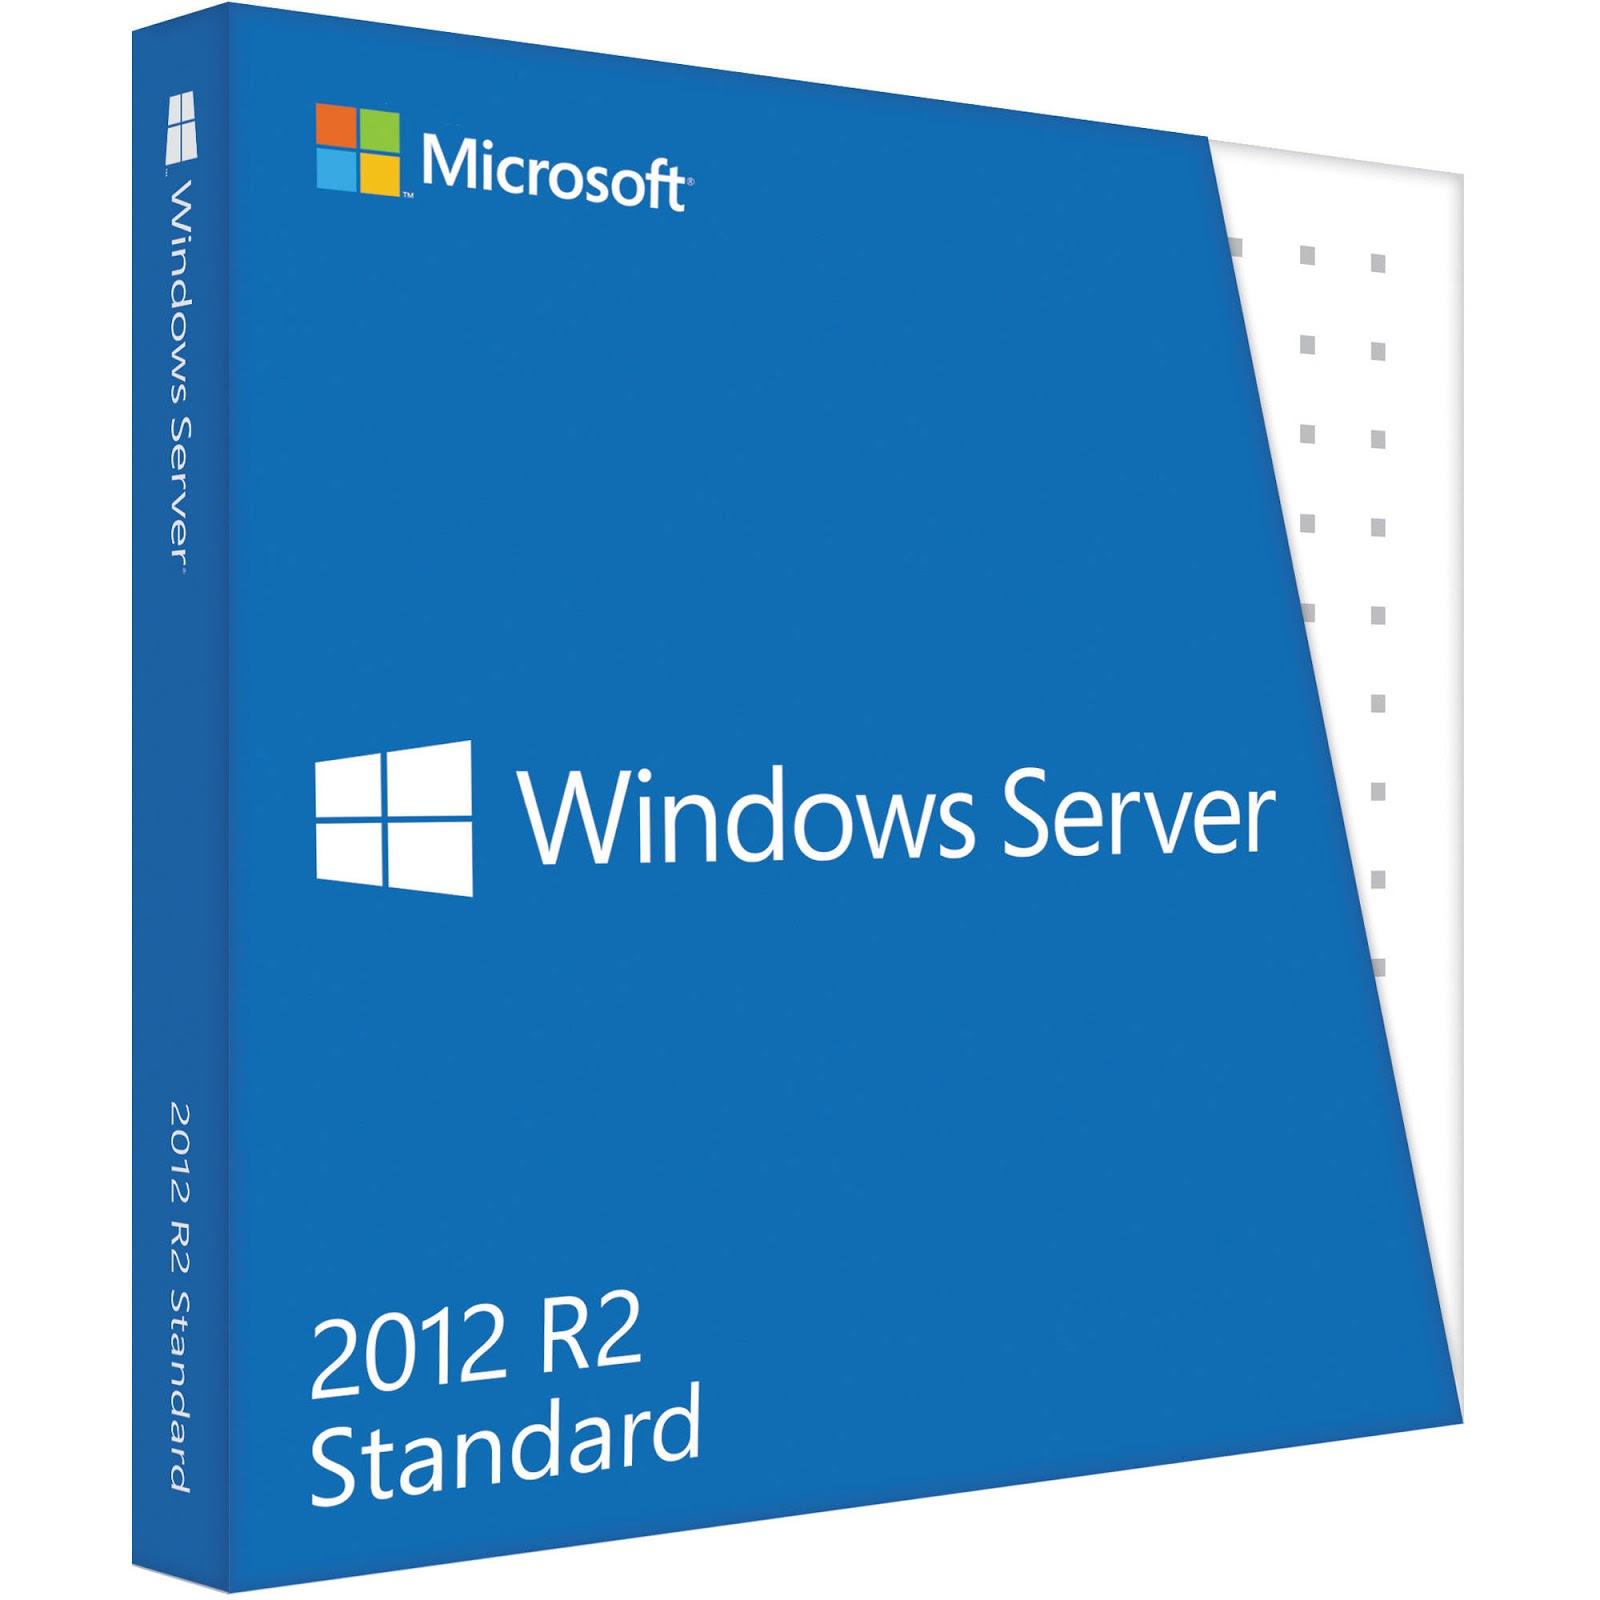 windows server 2012 r2 free download iso 64 bit